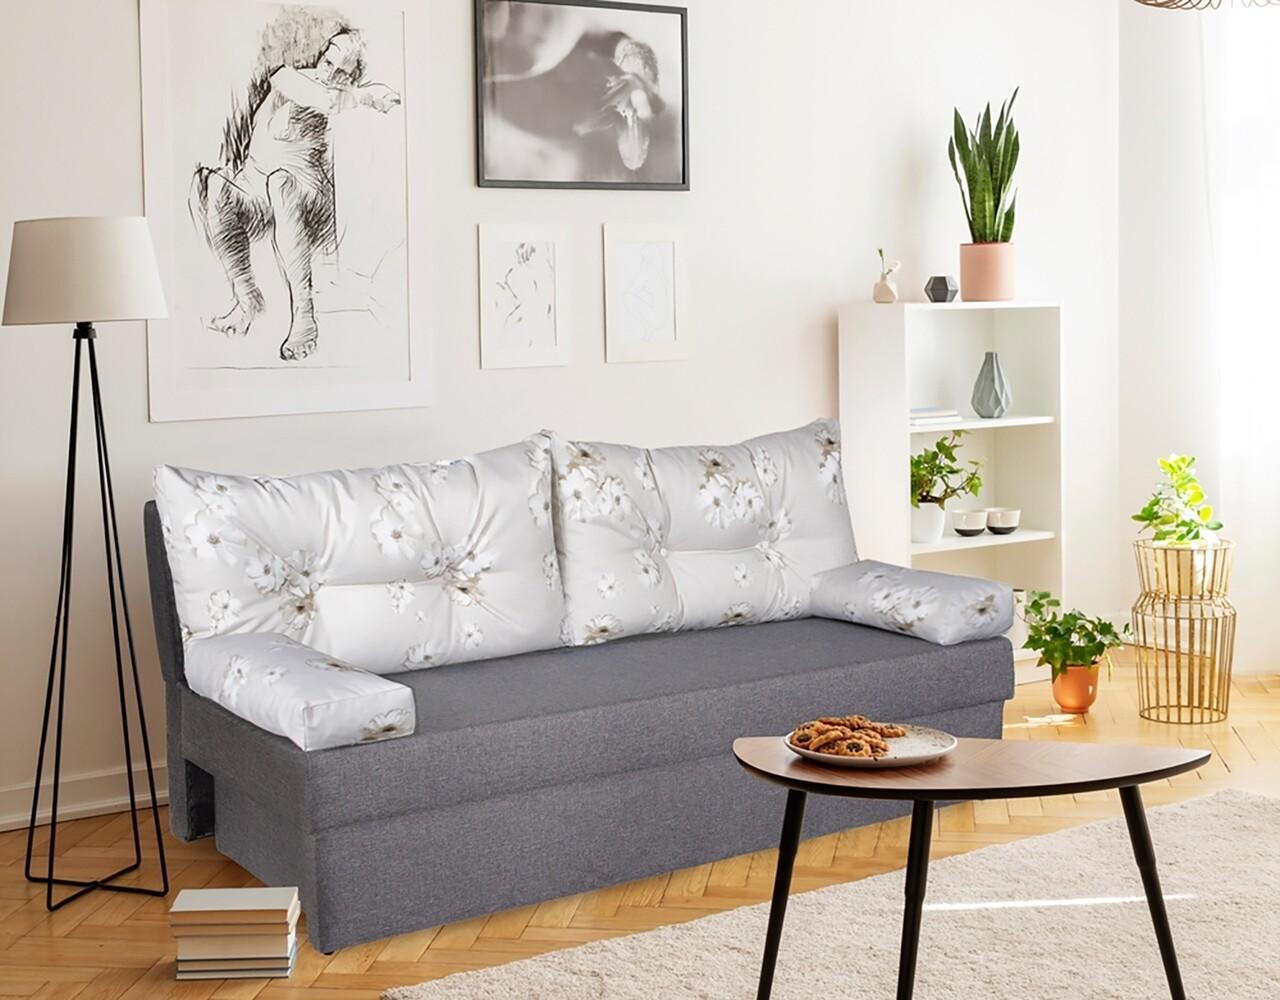 Canapea extensibila Alfi Grey 192x80x77 cm cu lada de depozitare, Daisies Flower